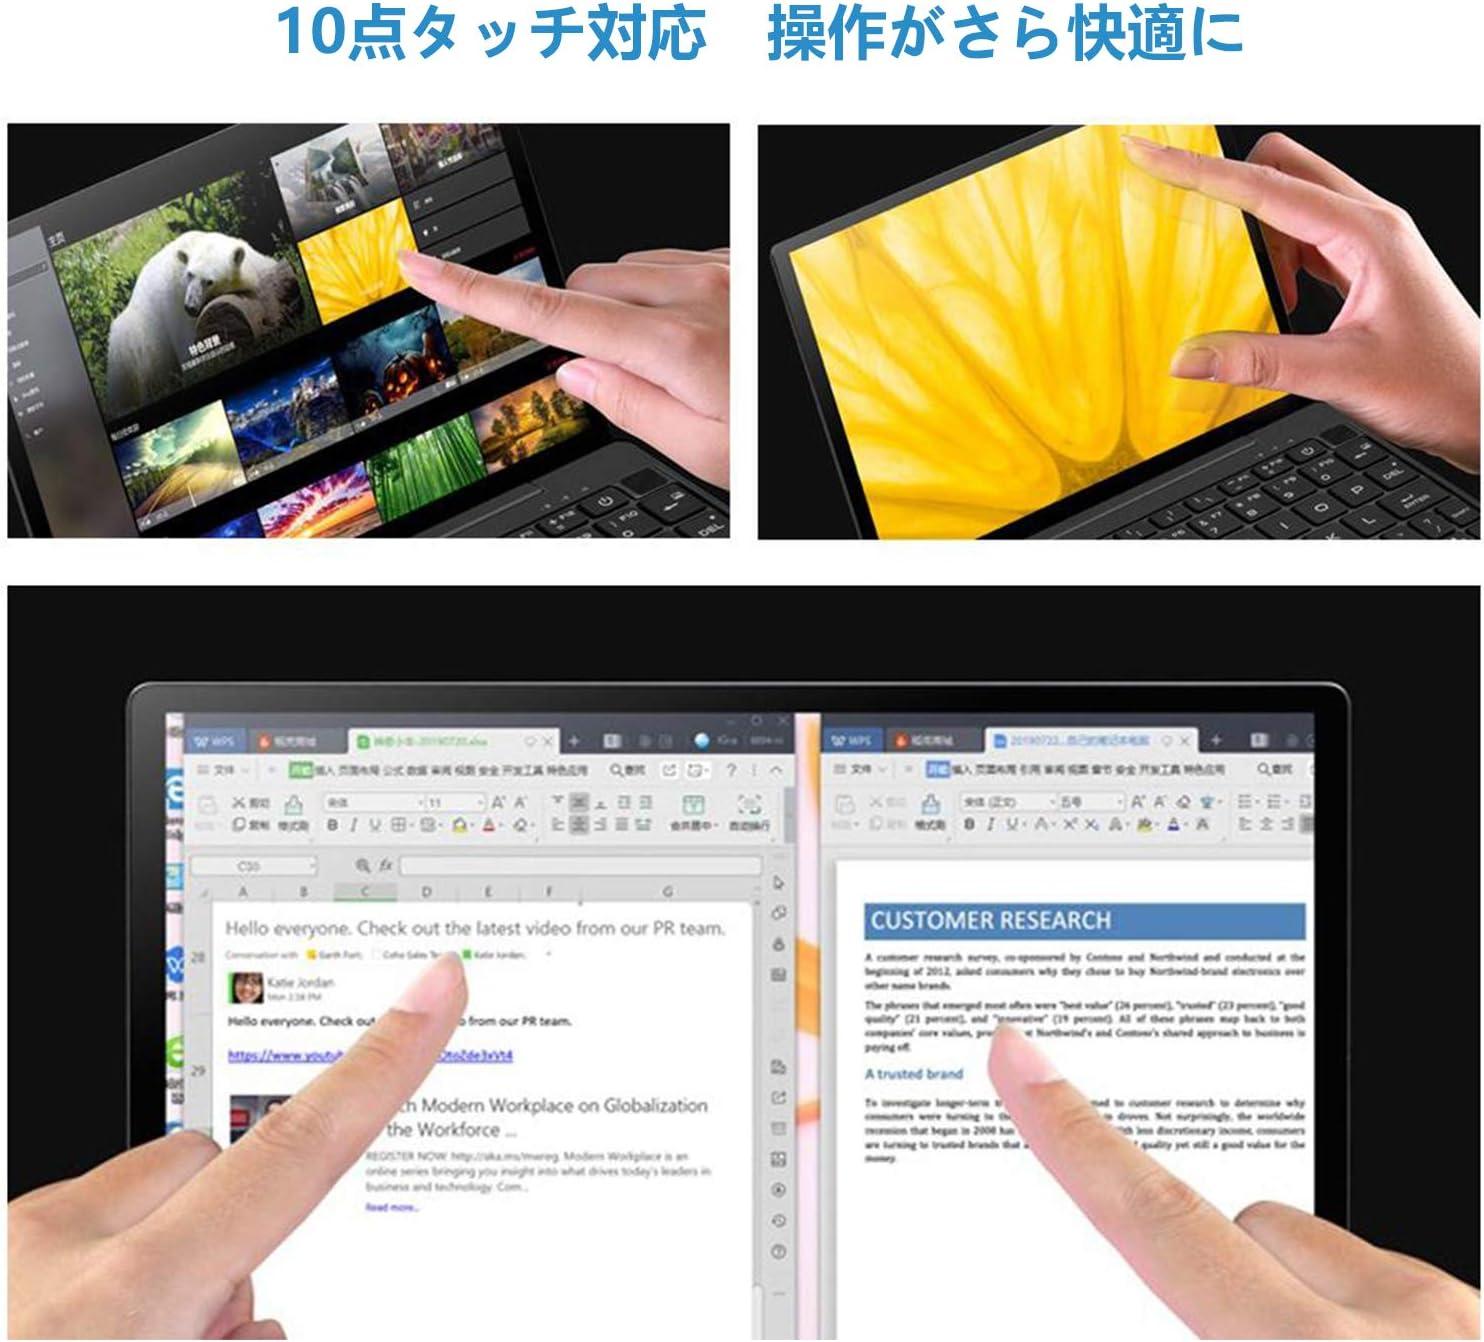 MAG1 Core i7-8500Y 限定販売版